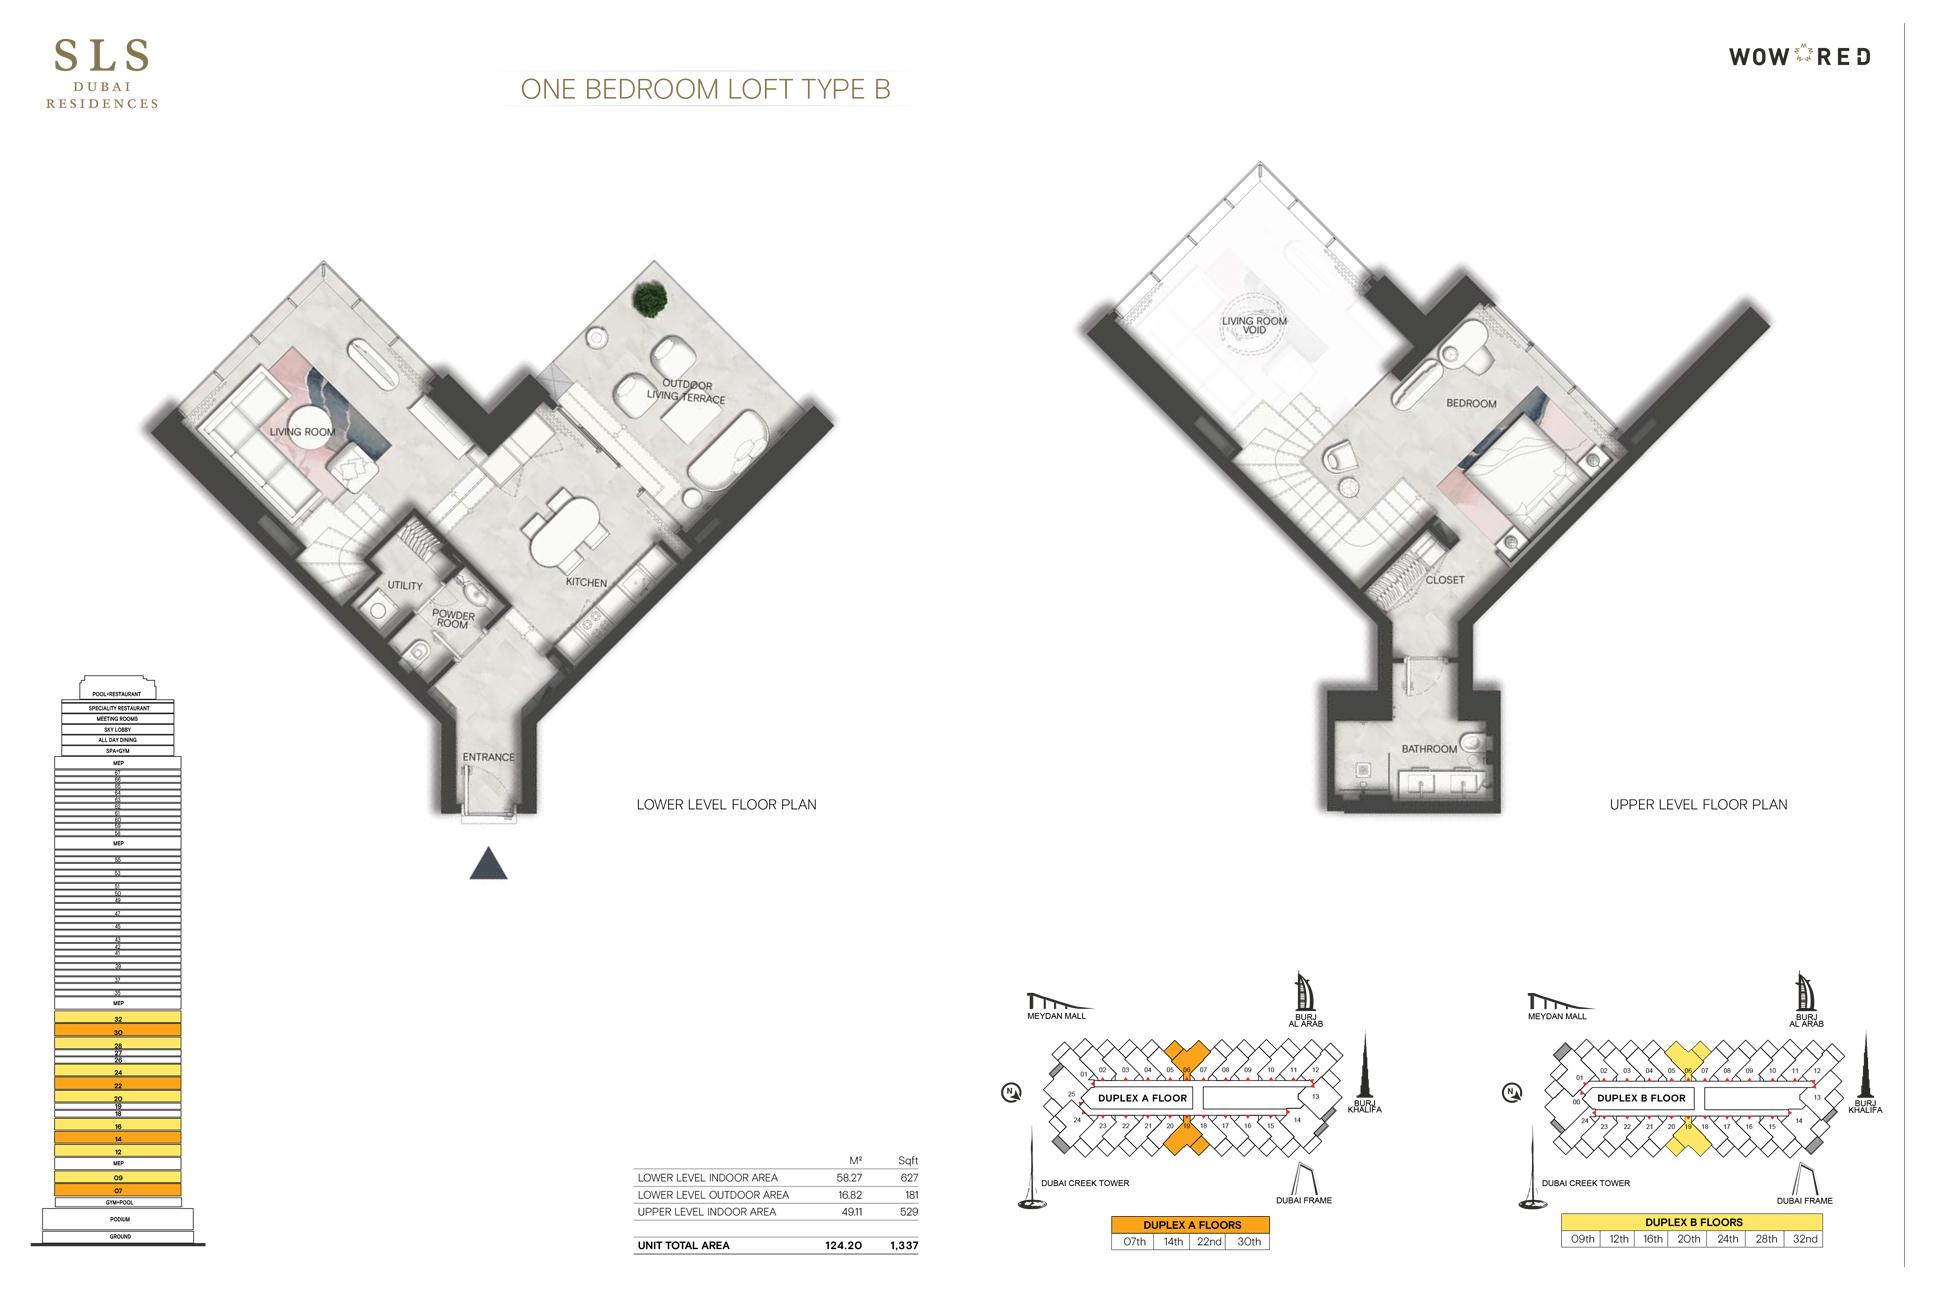 1 Bedroom Loft Type B Size 1337 sq.ft